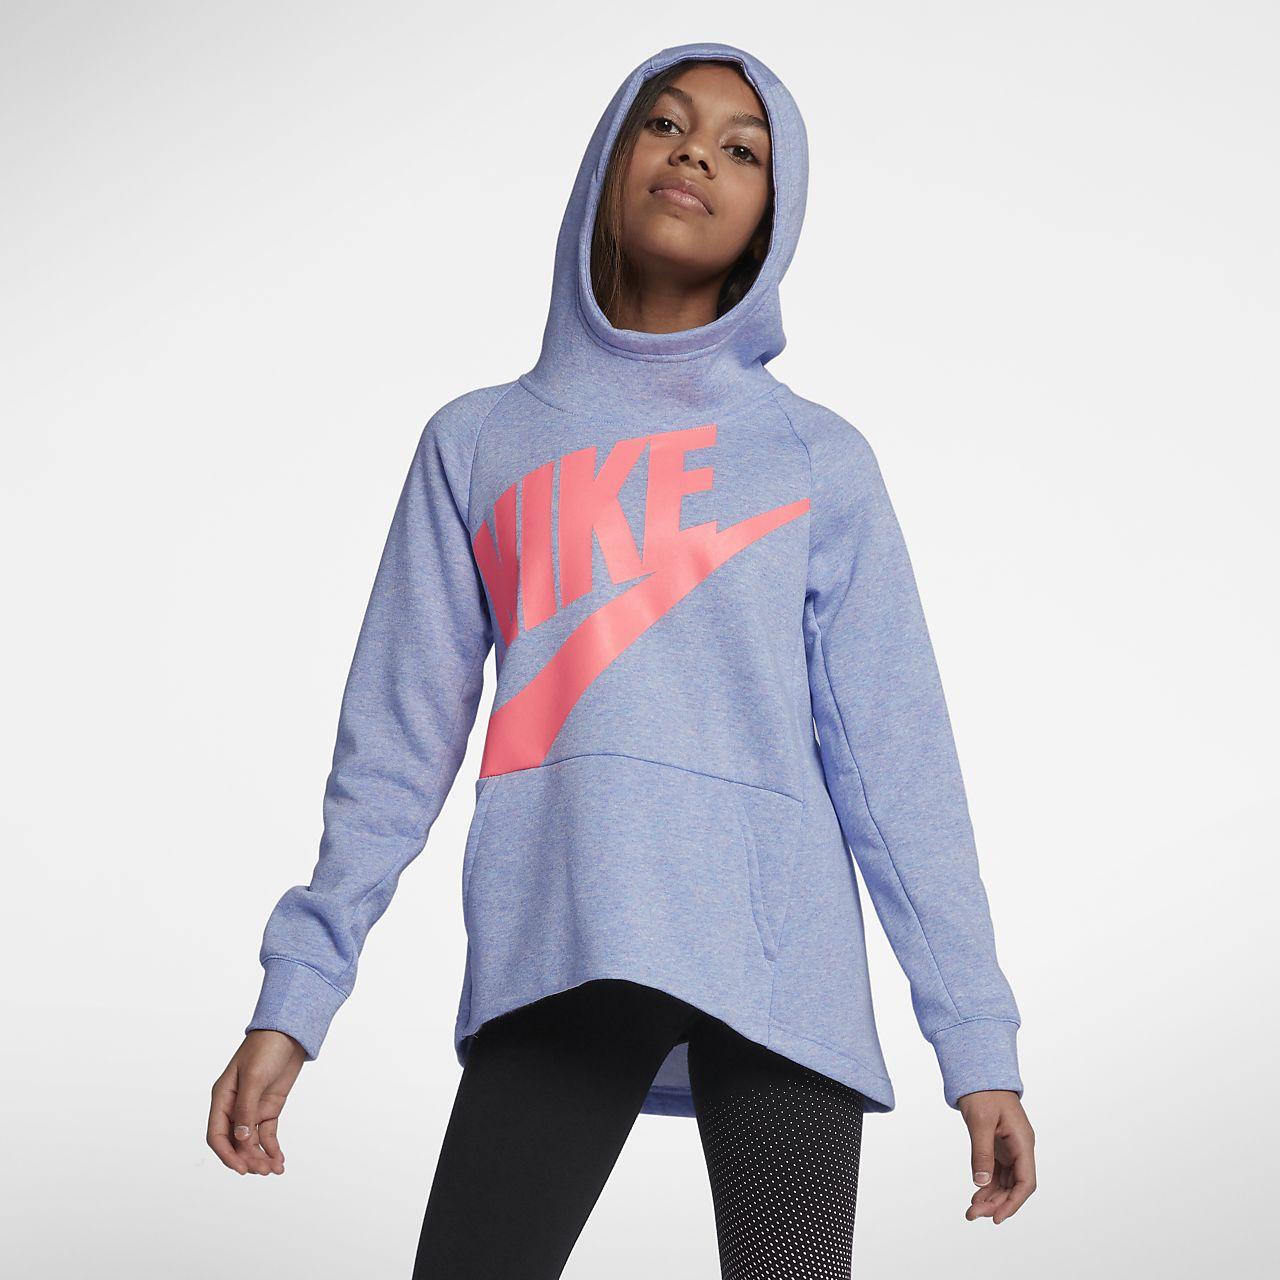 98ef61f9b995 Nike Sportswear Big Kids  (Girls ) Pullover Hoodie. Nike.com